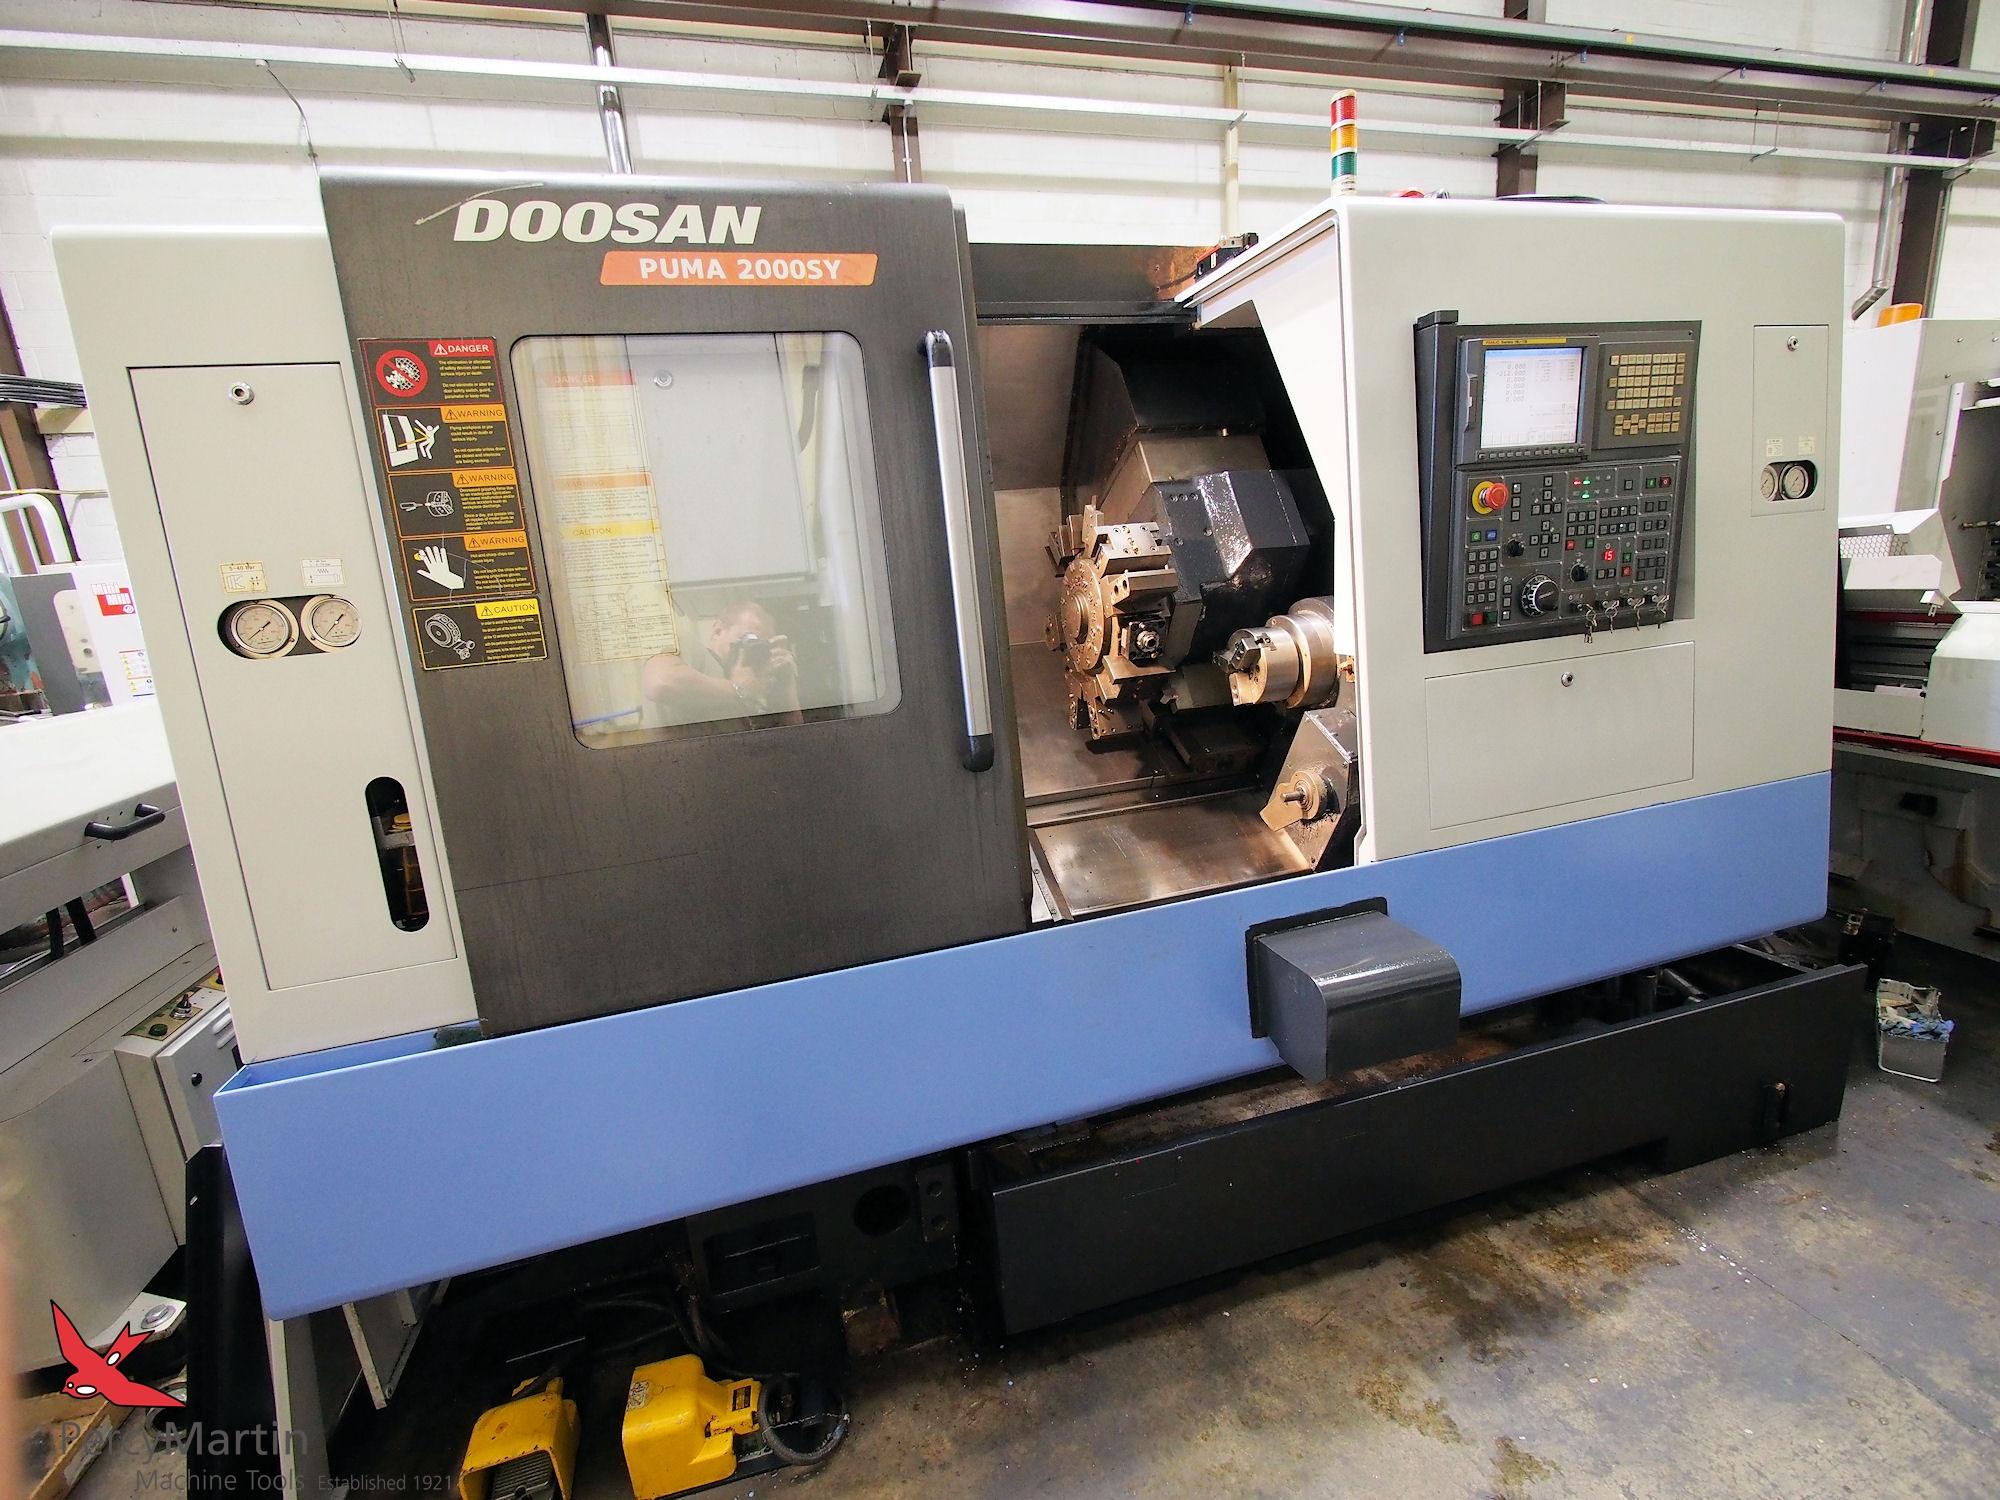 used doosan puma 2000sy 2007 cnc lathes with milling for sale rh fr percymartin co uk 2 Door CNC Lathe Mazak CNC Lathe